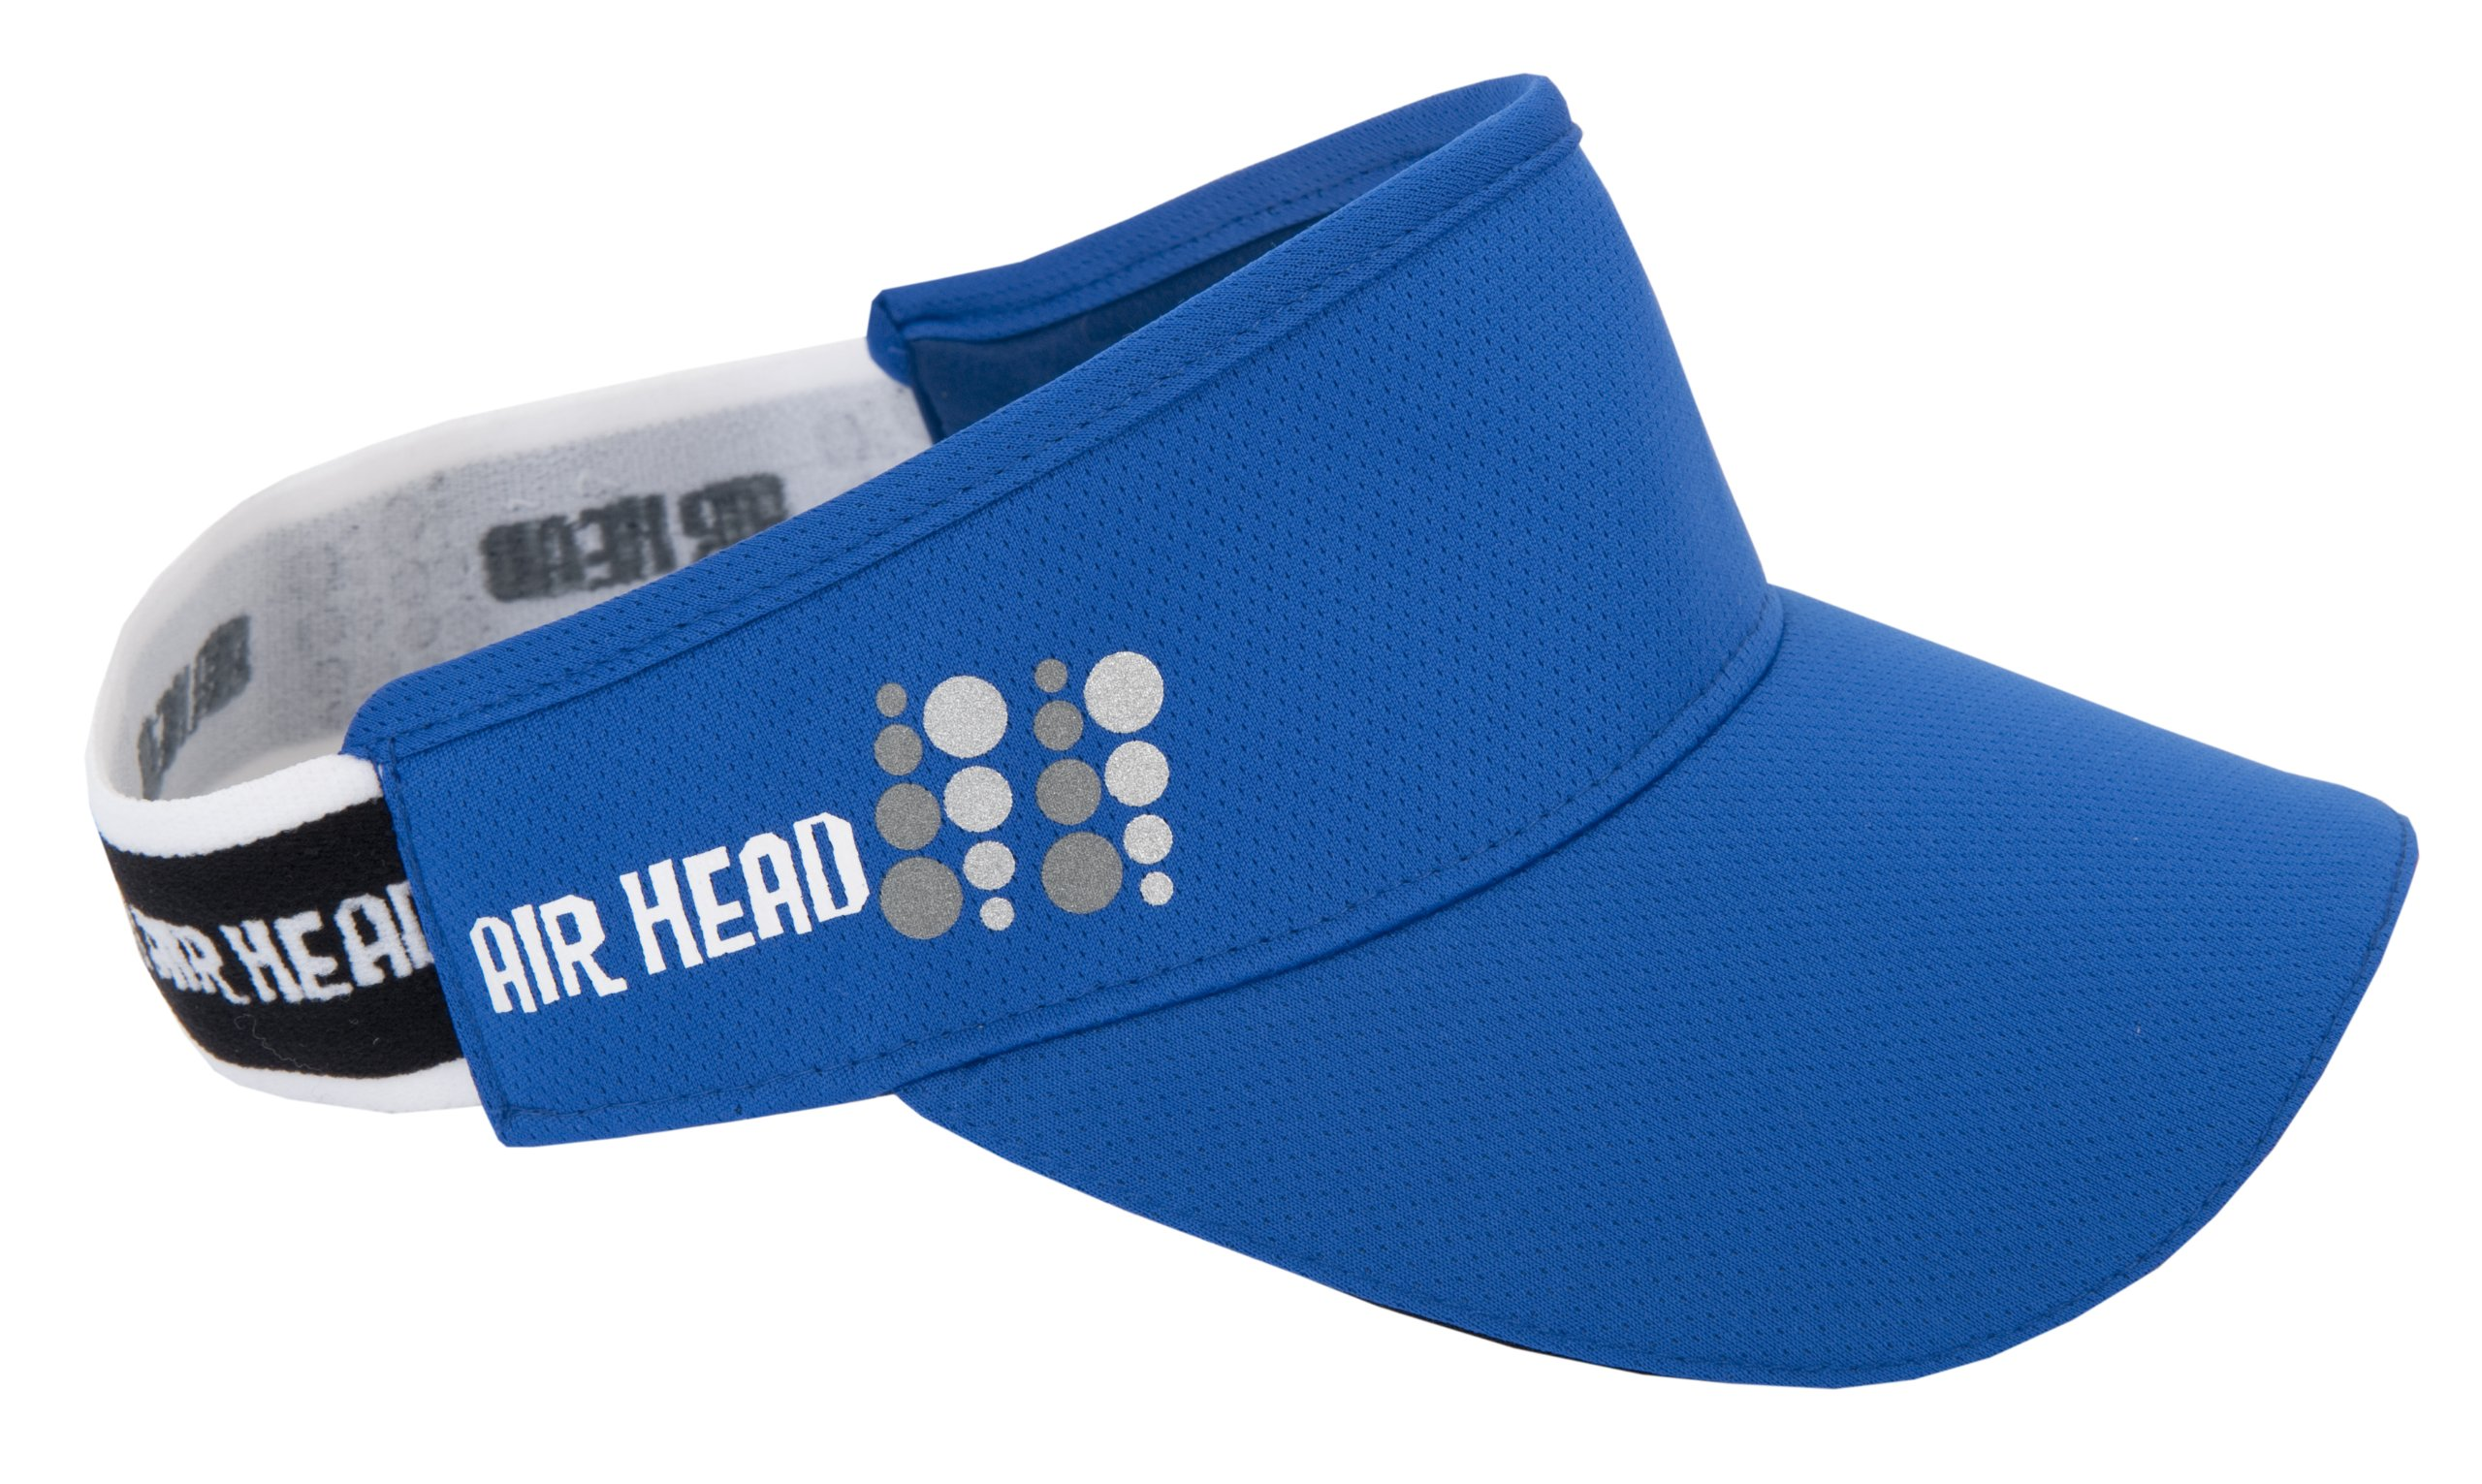 Ultraleicht Crewroom Air Head Baseballkappe